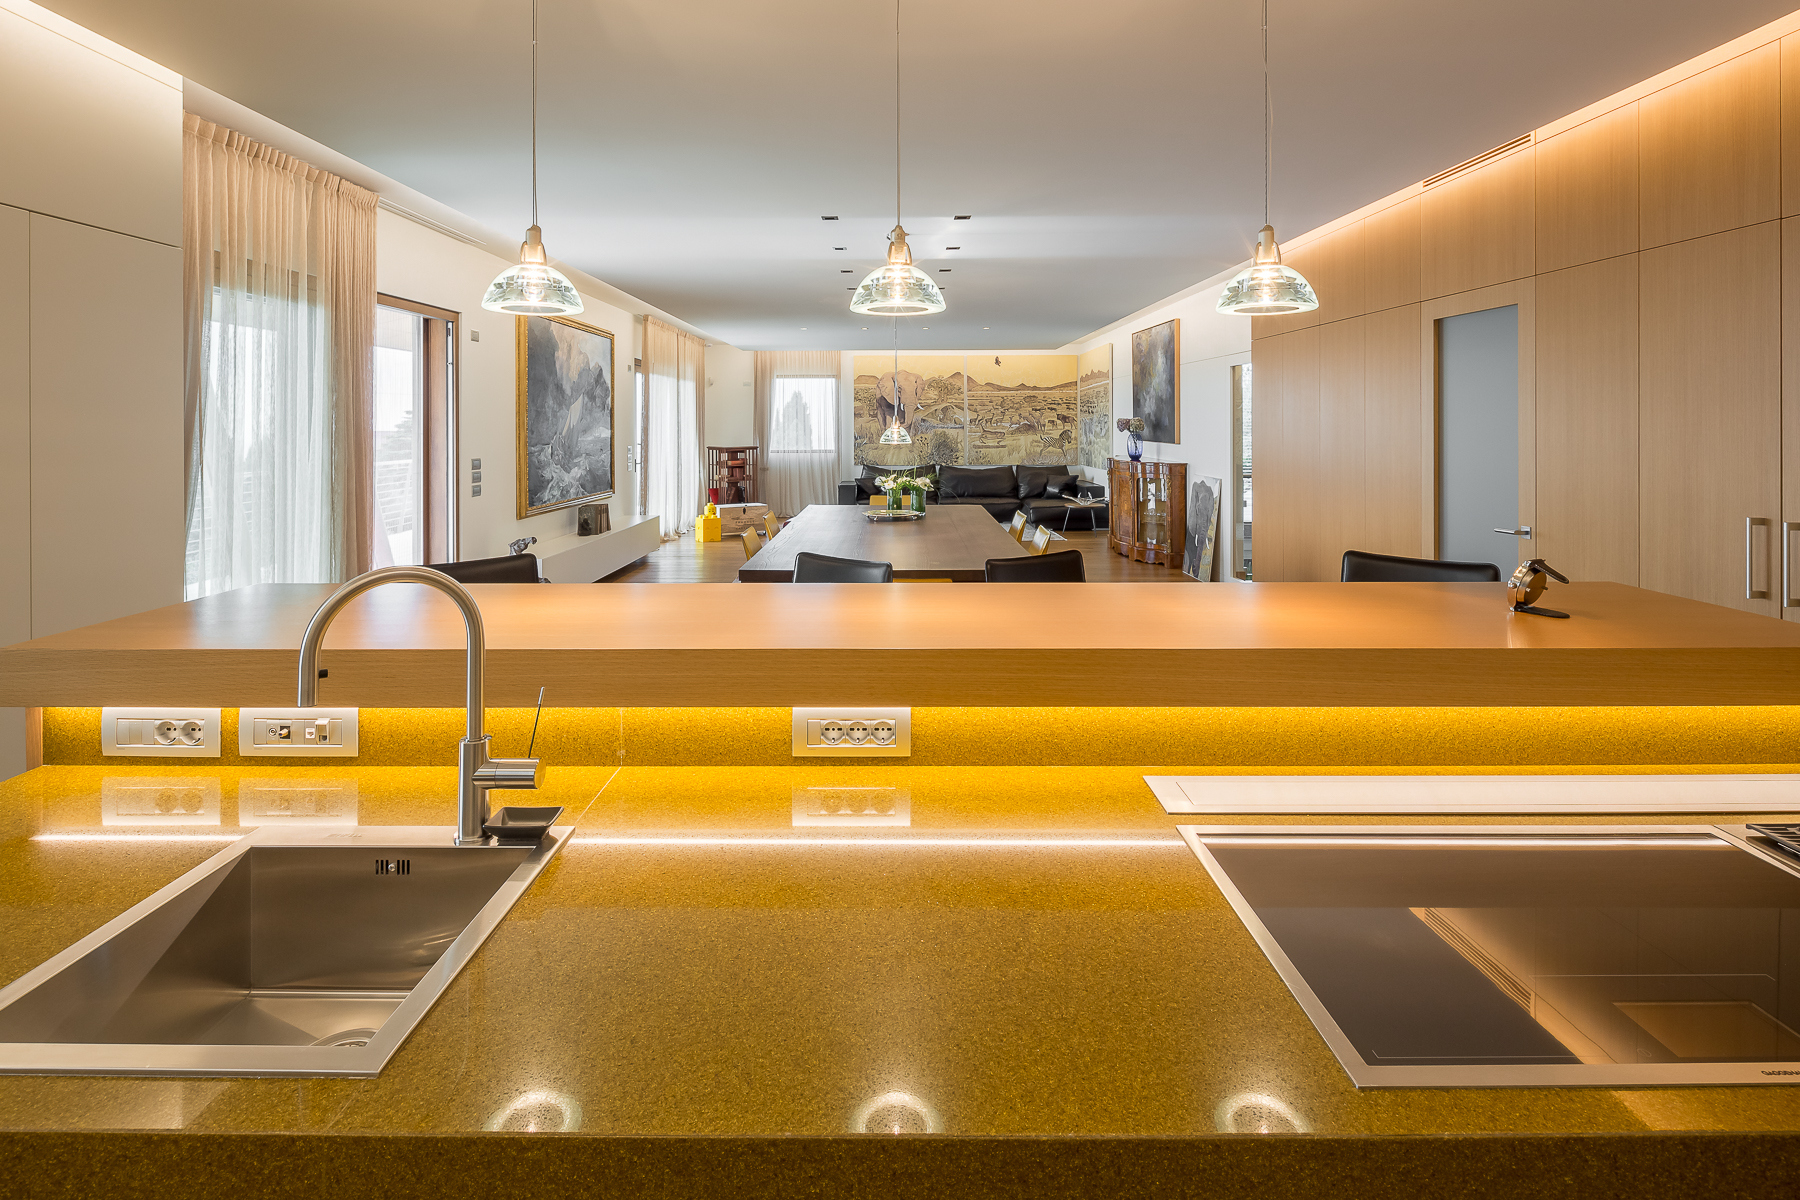 Villa in Vendita a Verona: 5 locali, 630 mq - Foto 8